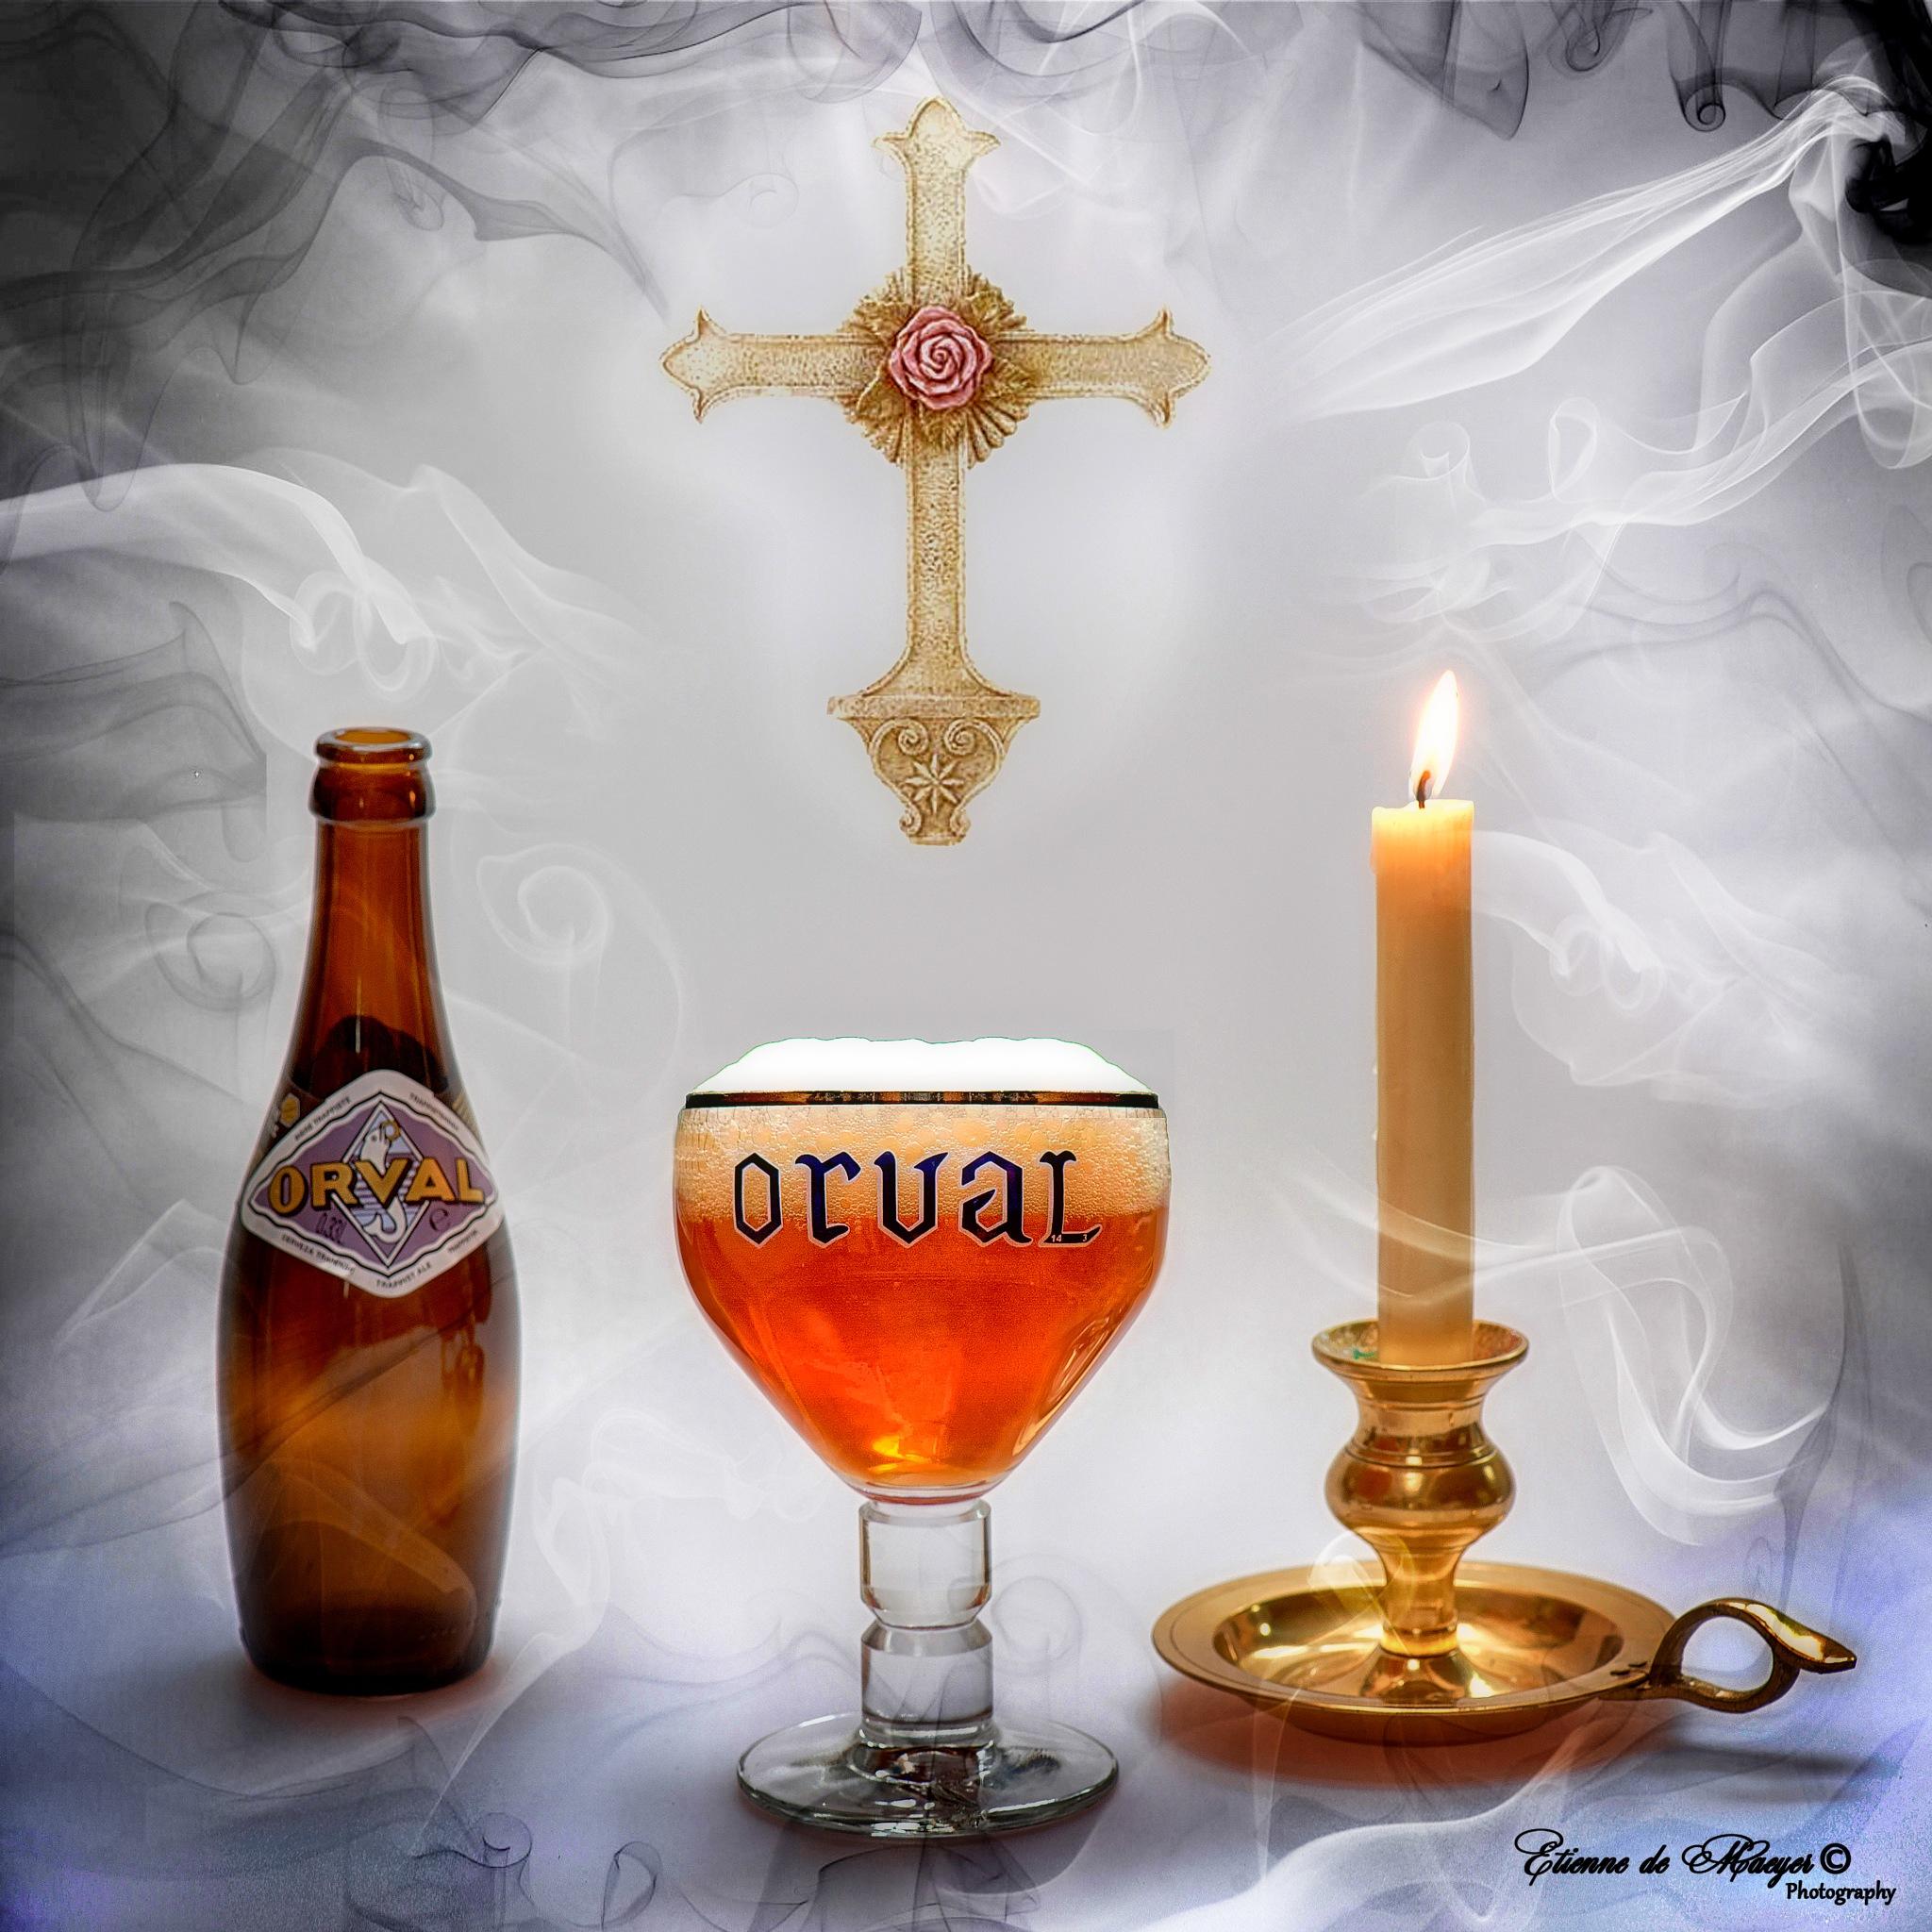 Orval... by Etienne de Maeyer